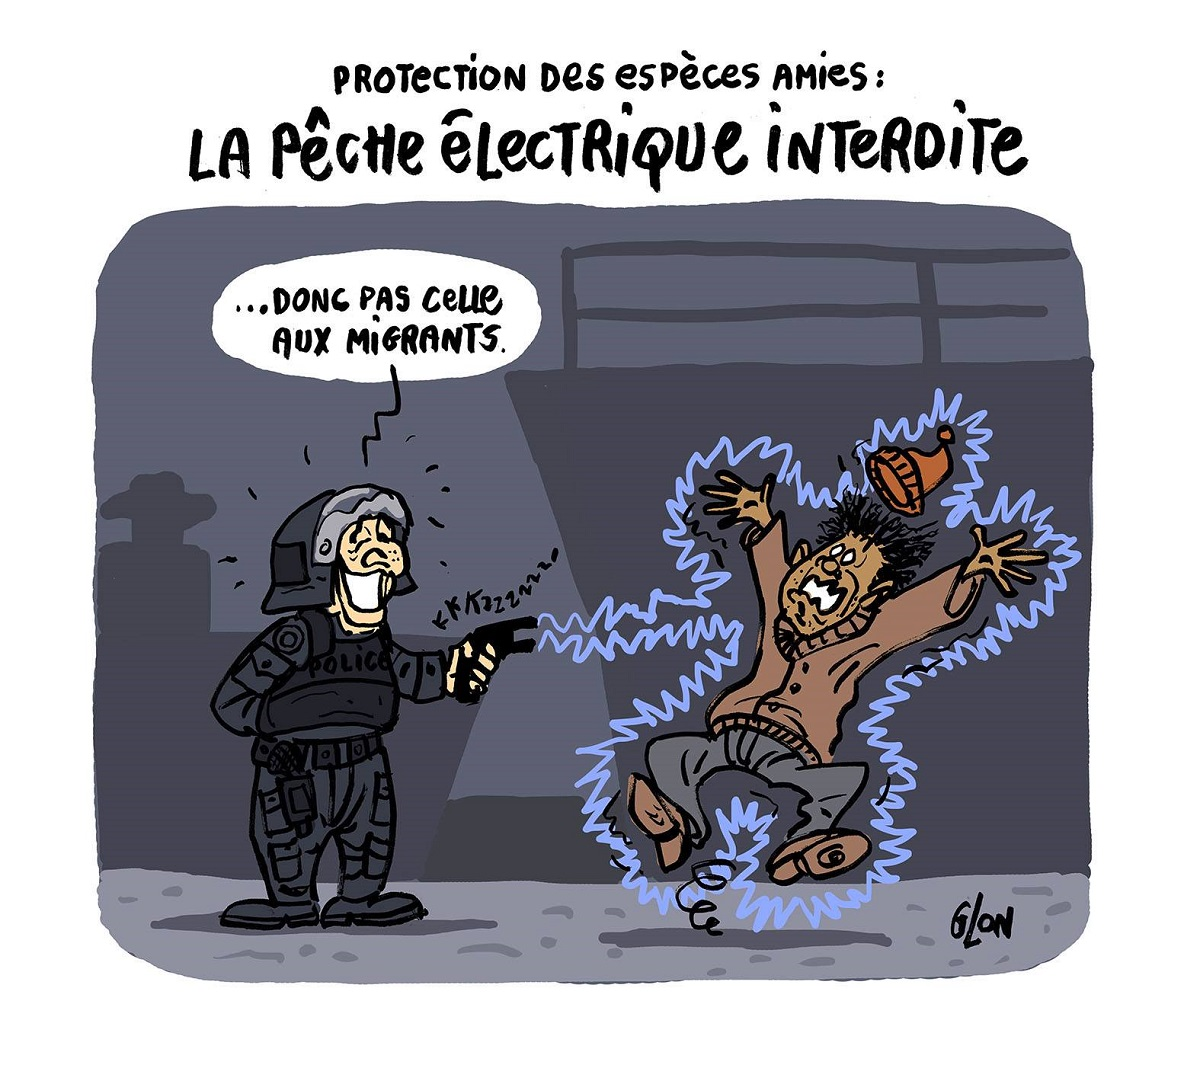 dessin humoristique d'un policier en train de taser un migrant